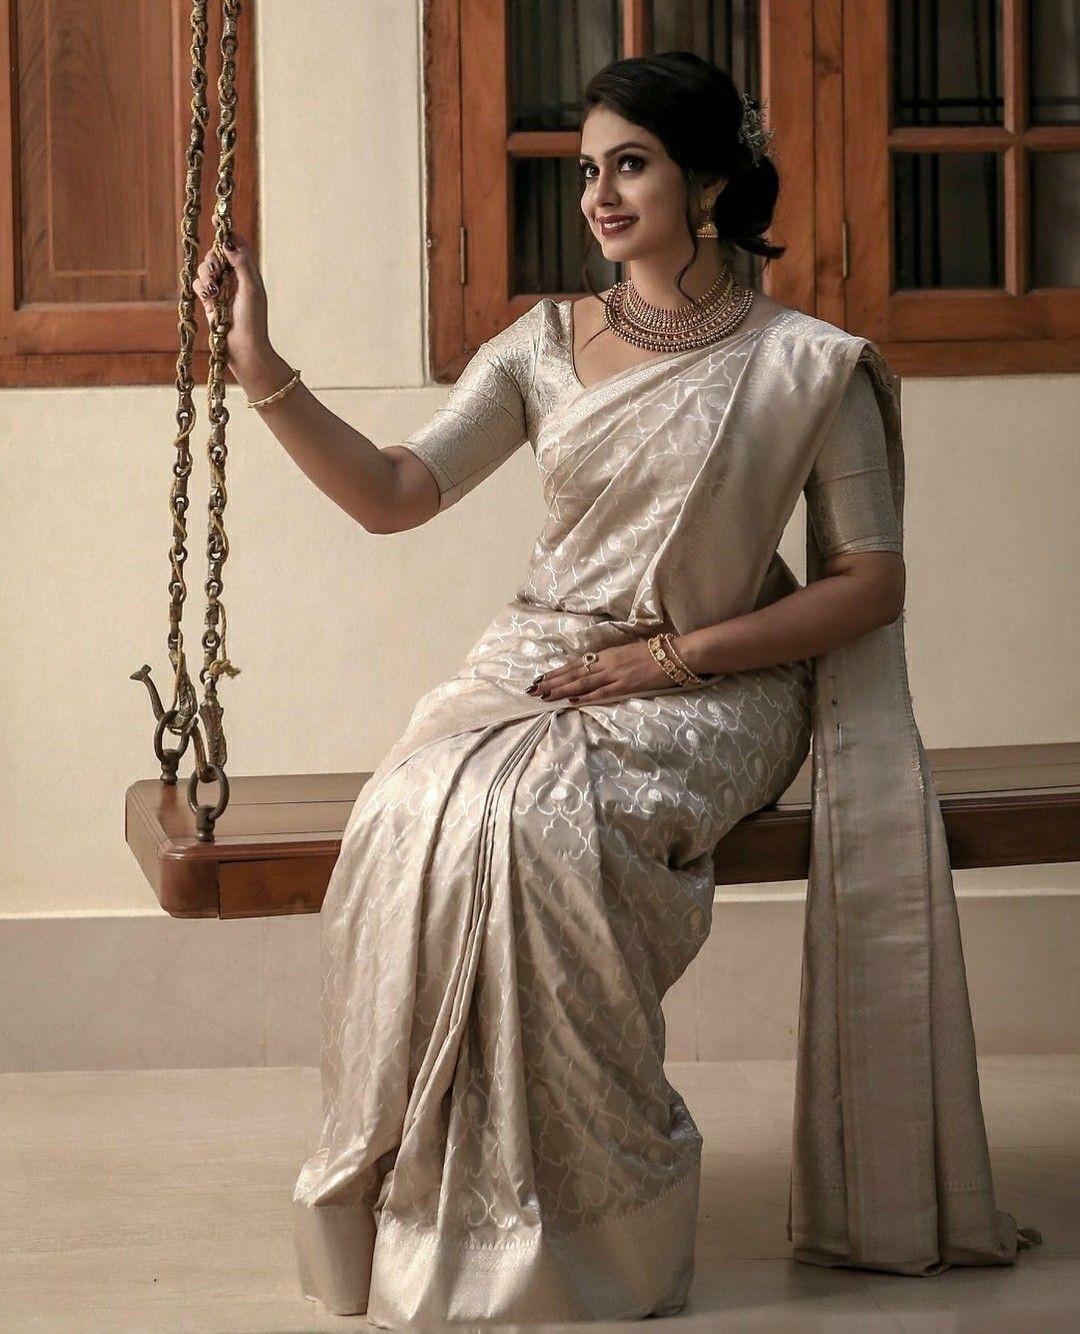 Pin By Mamatha Ramesh On Saree Christian Bridal Saree Bridal Saree Wedding Saree Indian